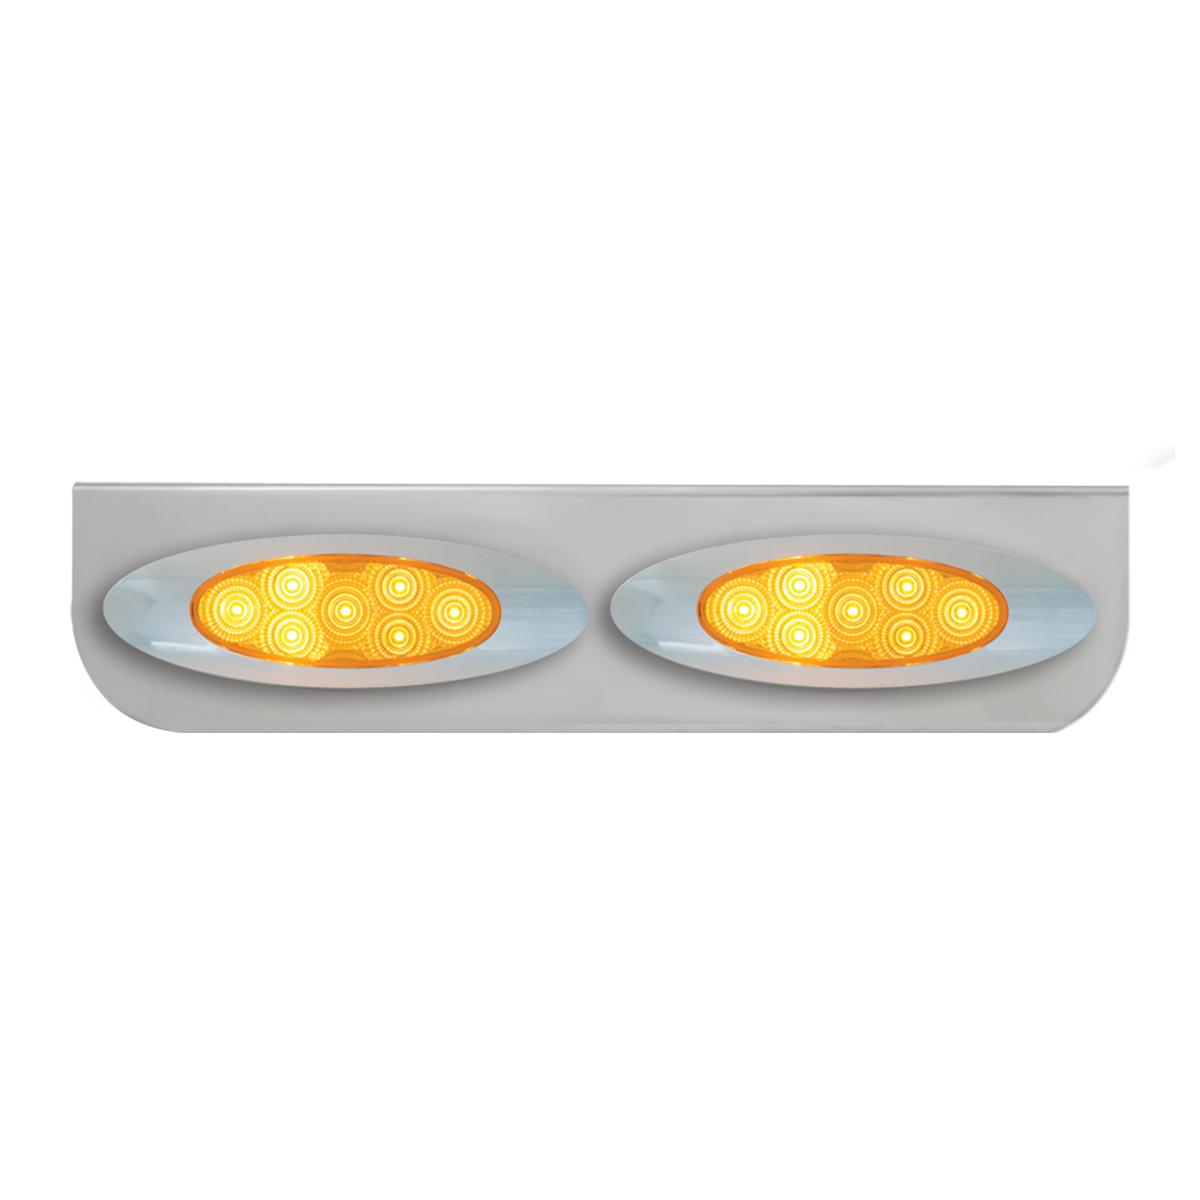 "#89046 Double Stainless Steel ""L"" Shape Light Bracket with Plug-In Y2K Spyder LED Lights"